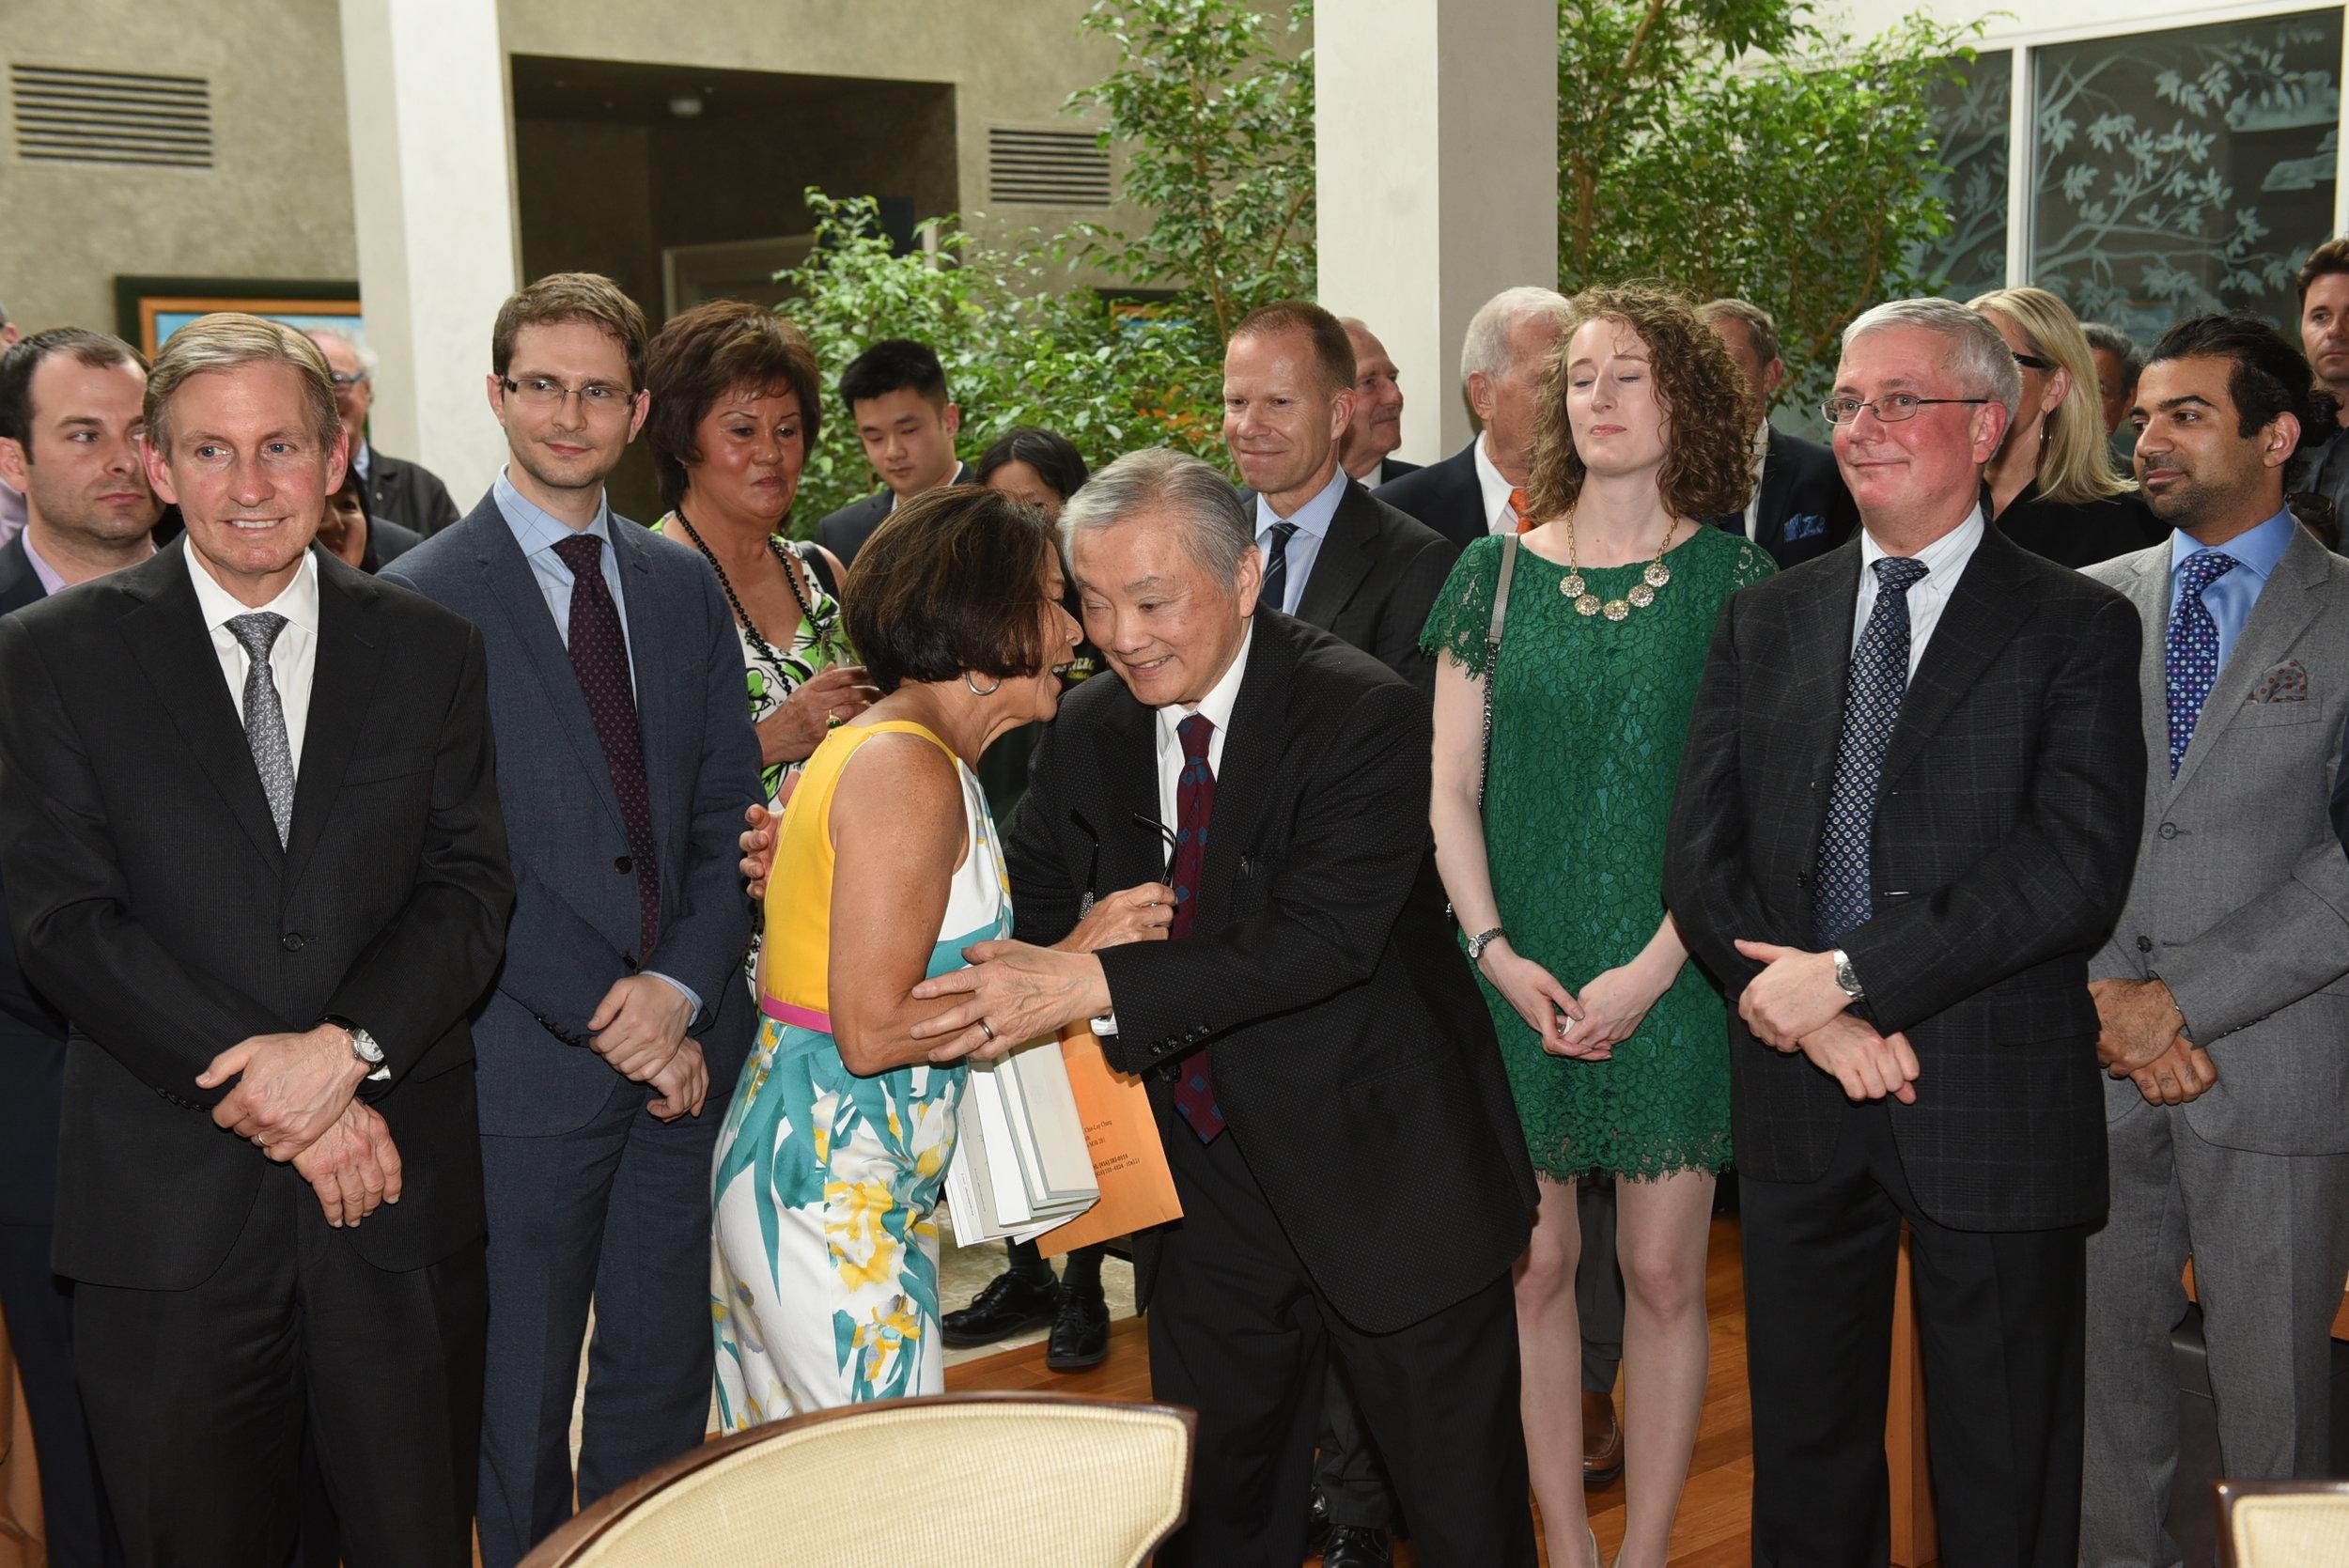 Donette Chin-Loy Chang congratulates Dr. Herbert Ho Ping Kong